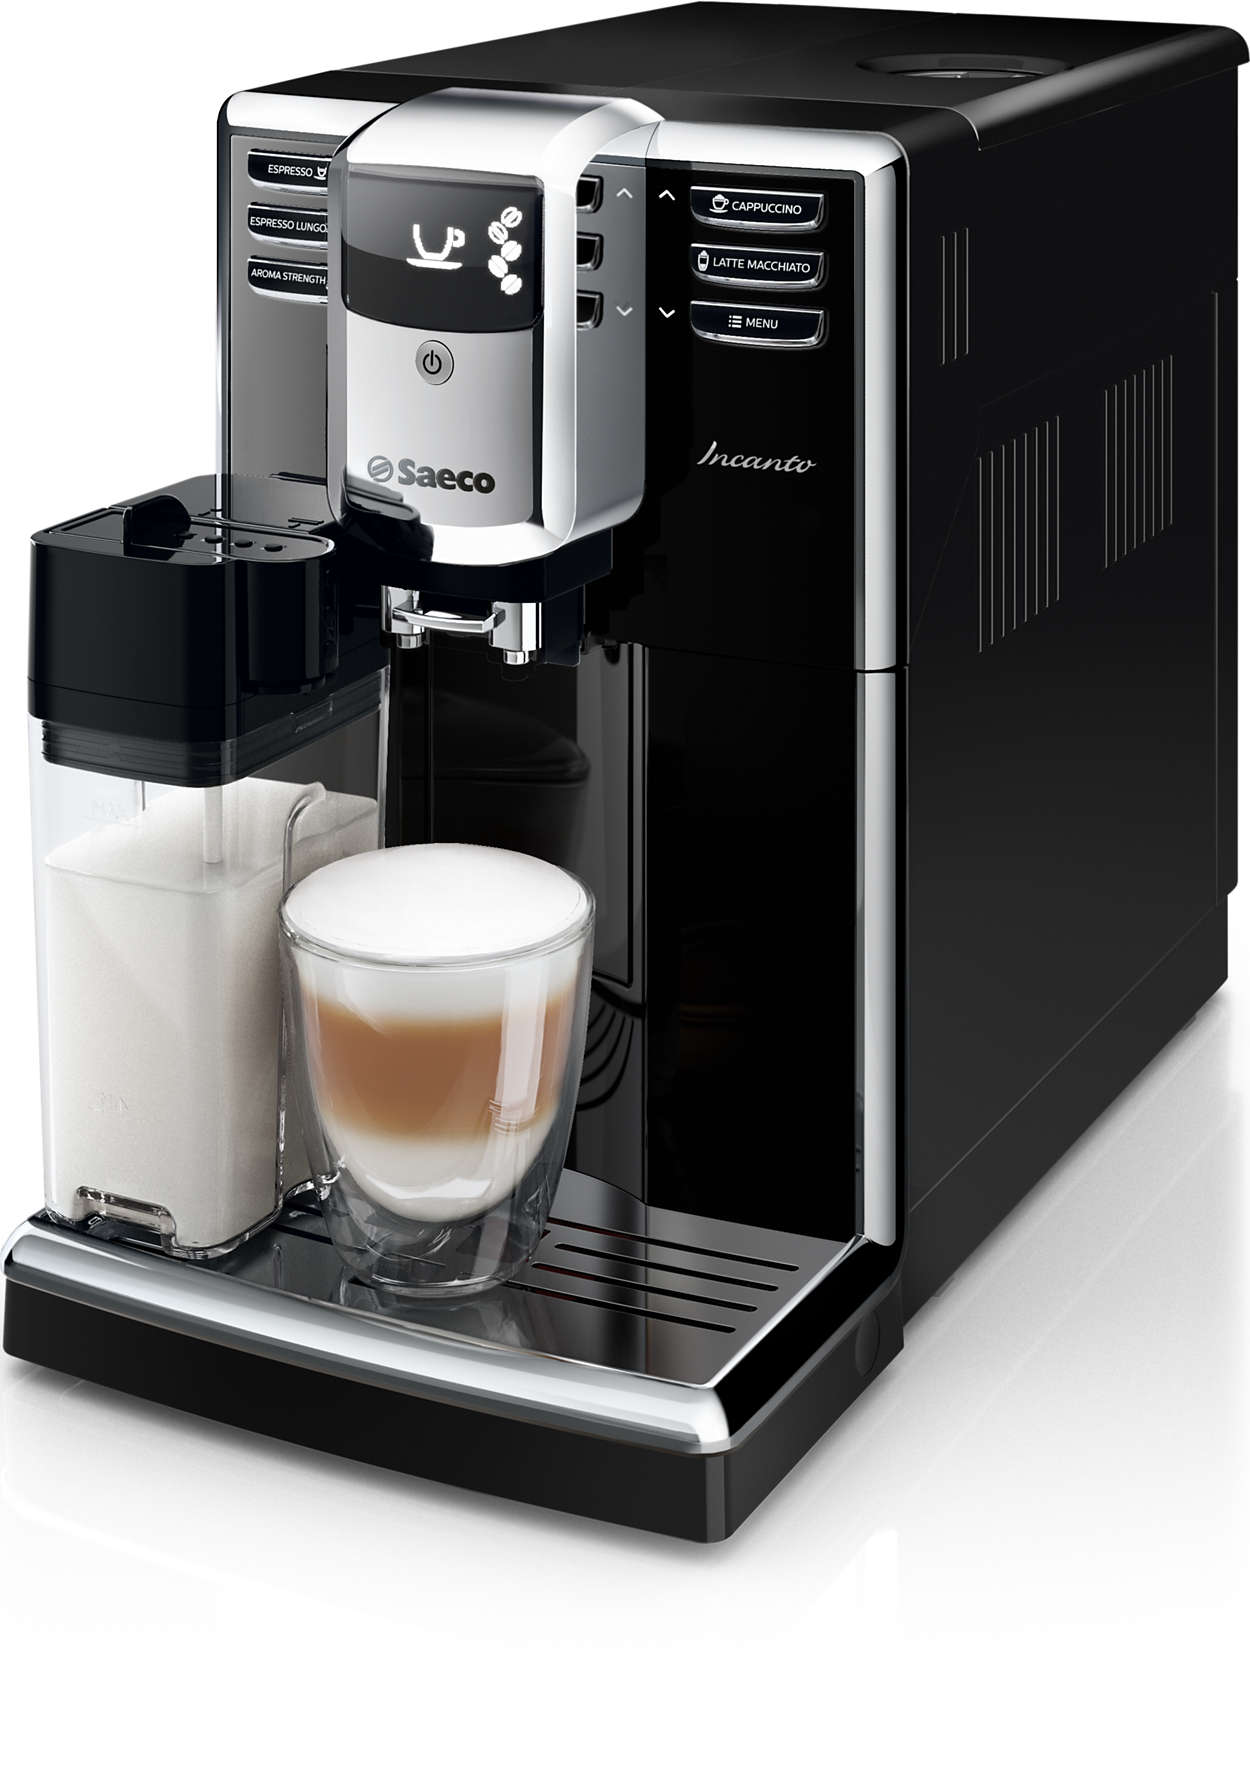 incanto automatyczny ekspres do kawy hd8916 09 saeco. Black Bedroom Furniture Sets. Home Design Ideas